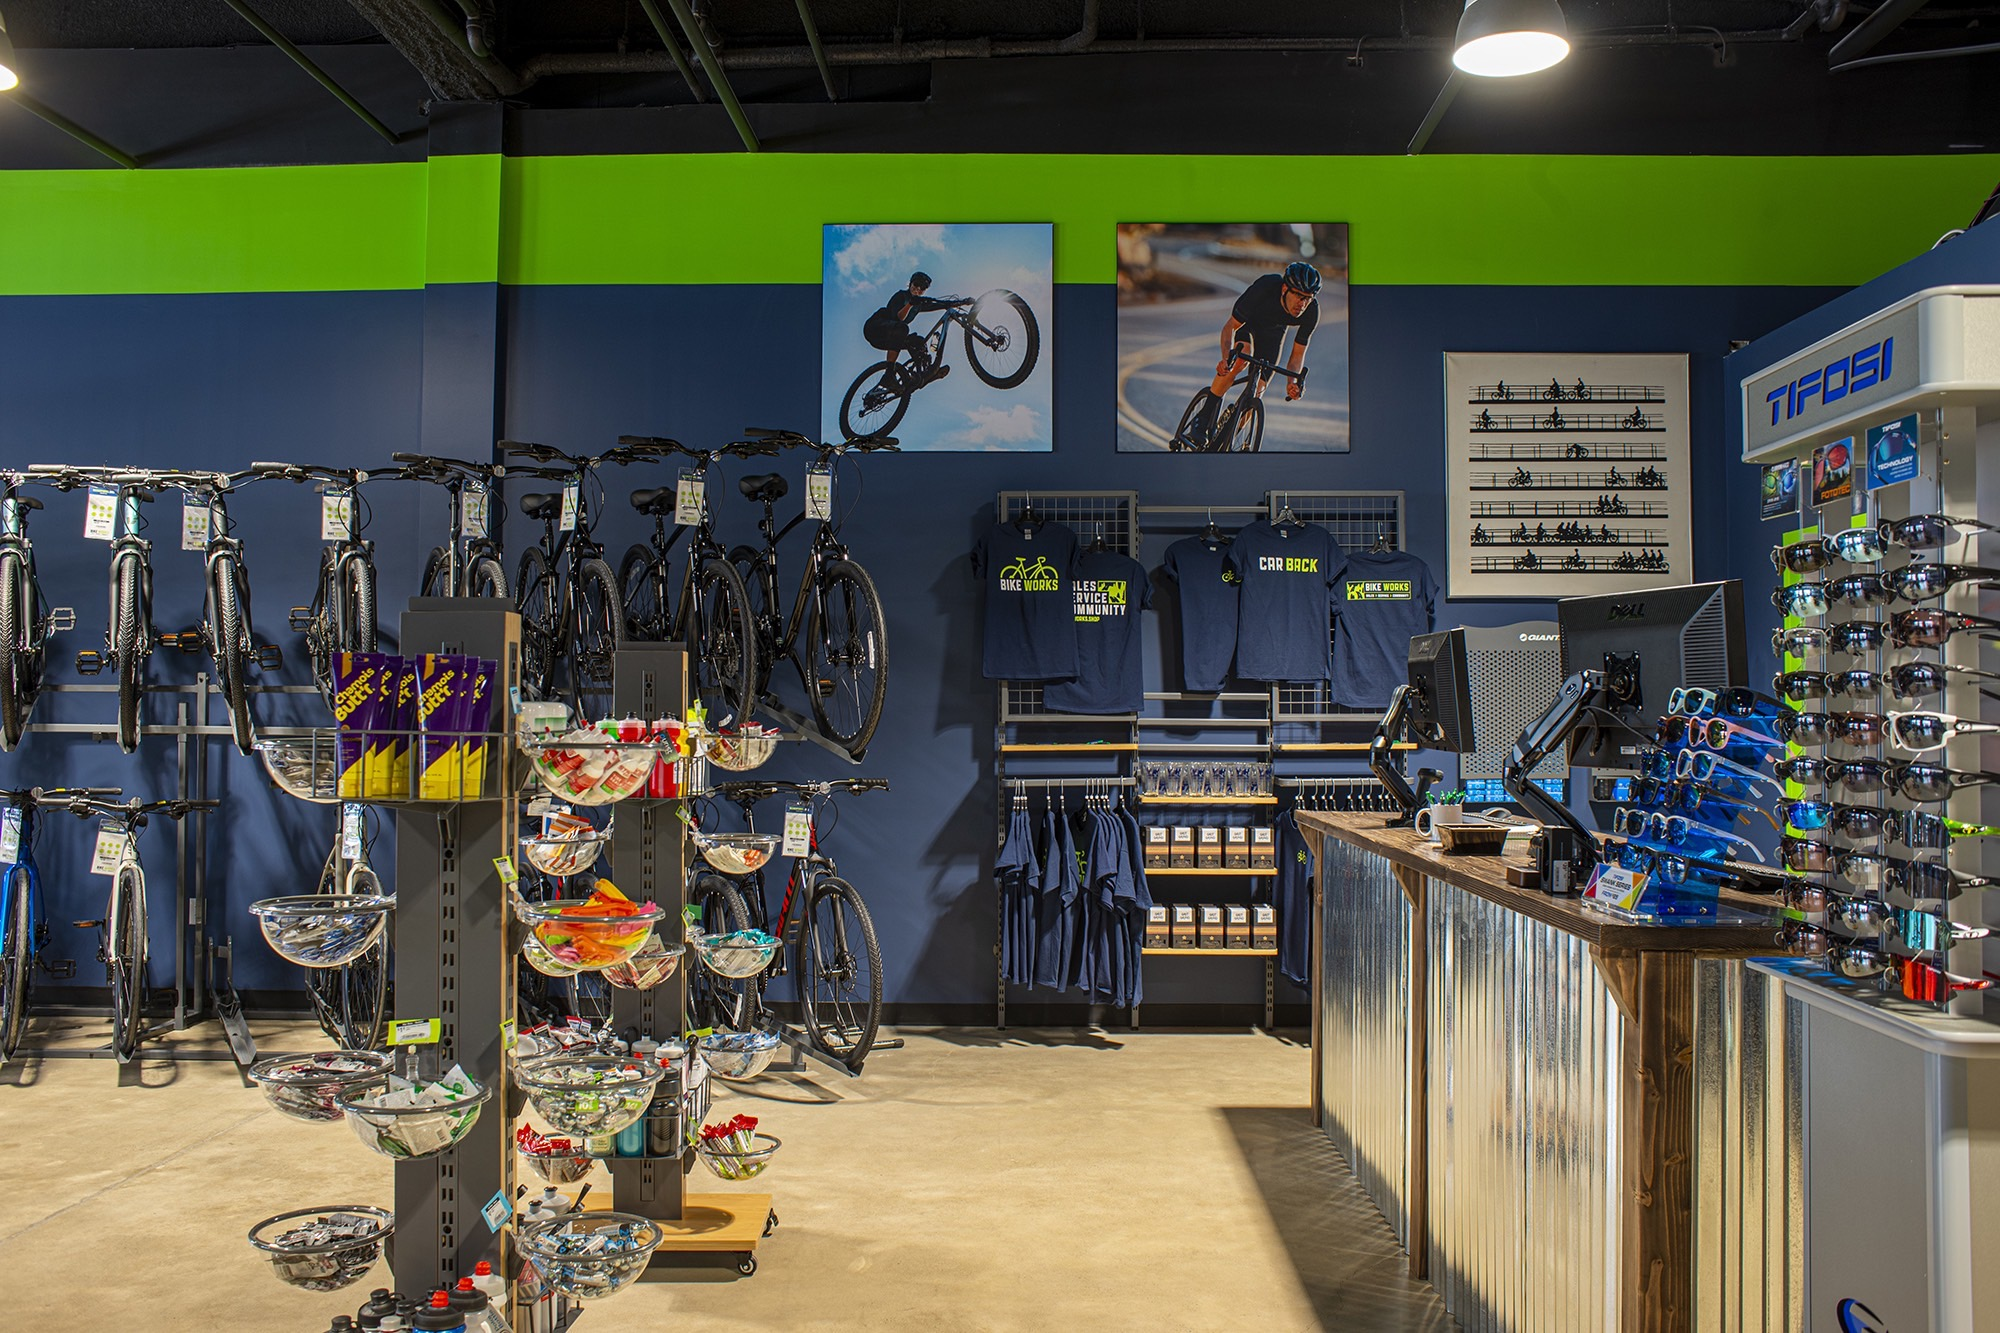 Bike Works opens new location in Newtown, Bucks County, PA